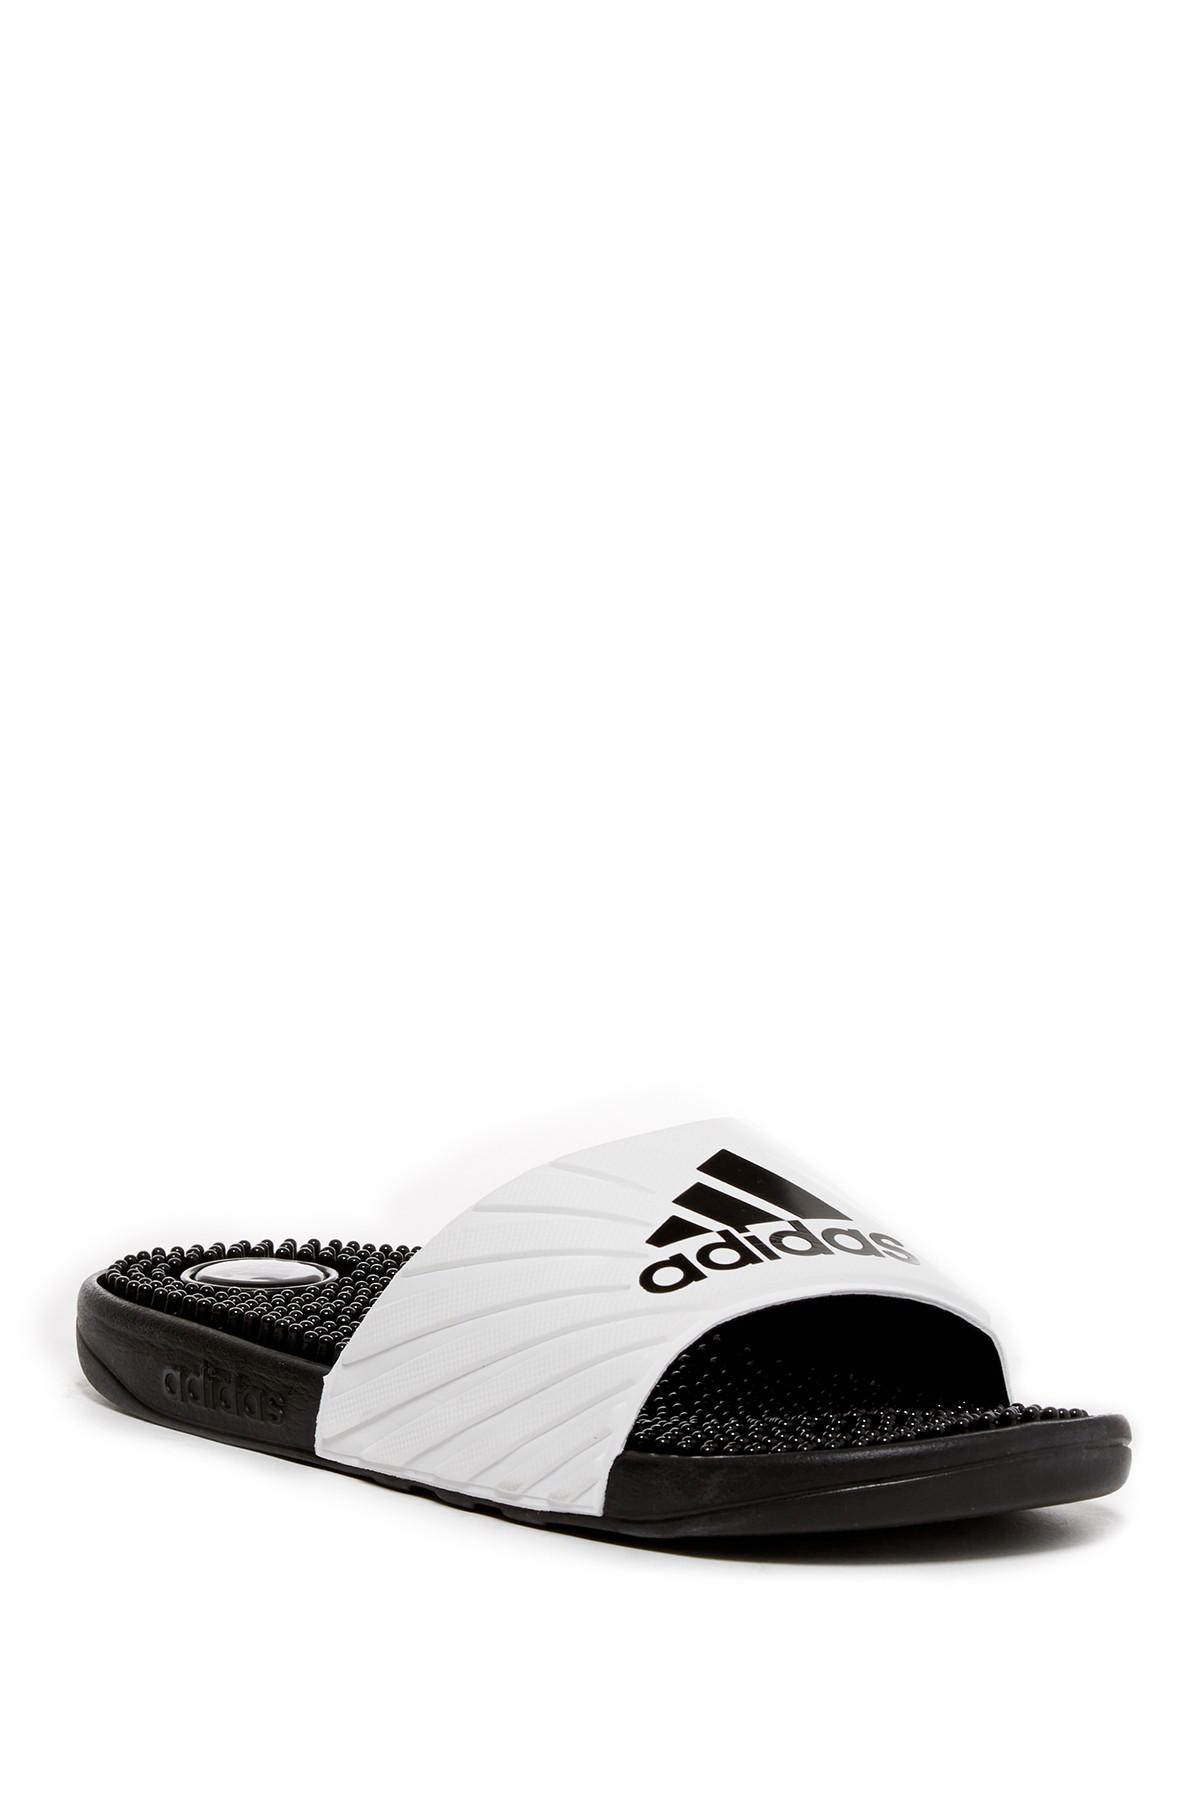 lyst adidas voloossage slide sandalo nero